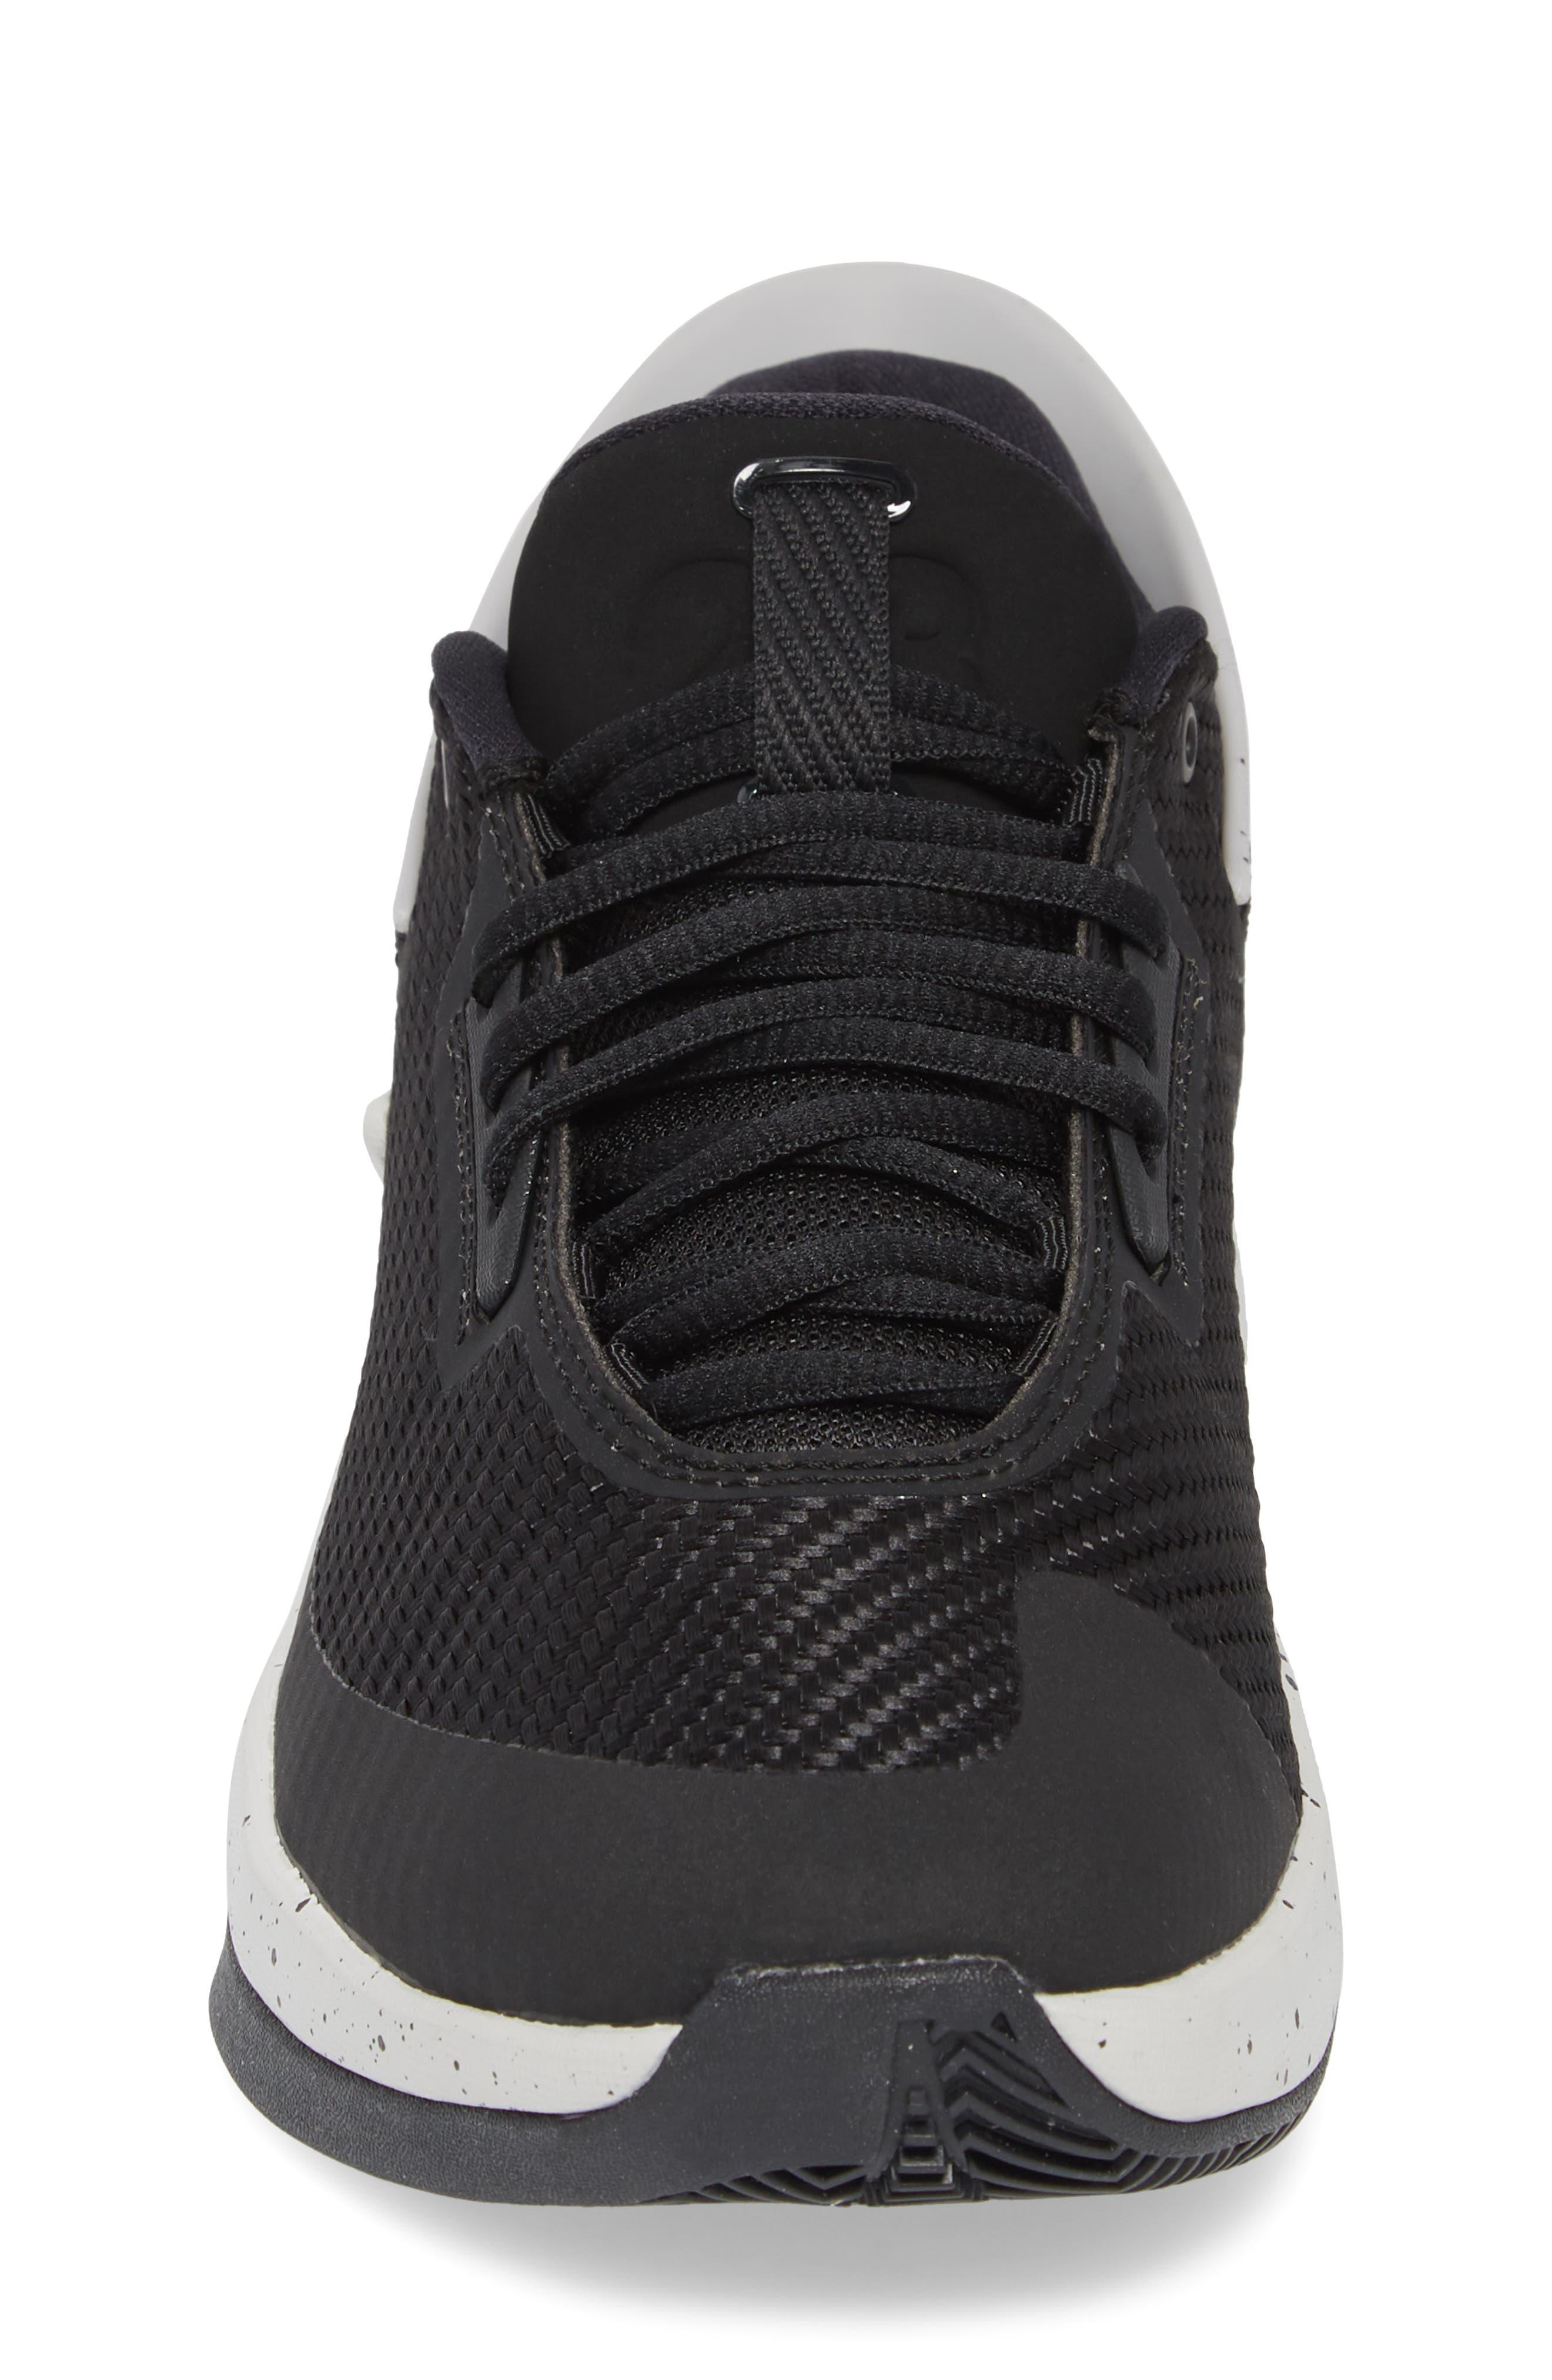 JORDAN,                             Nike Jordan Fly Lockdown Sneaker,                             Alternate thumbnail 4, color,                             010